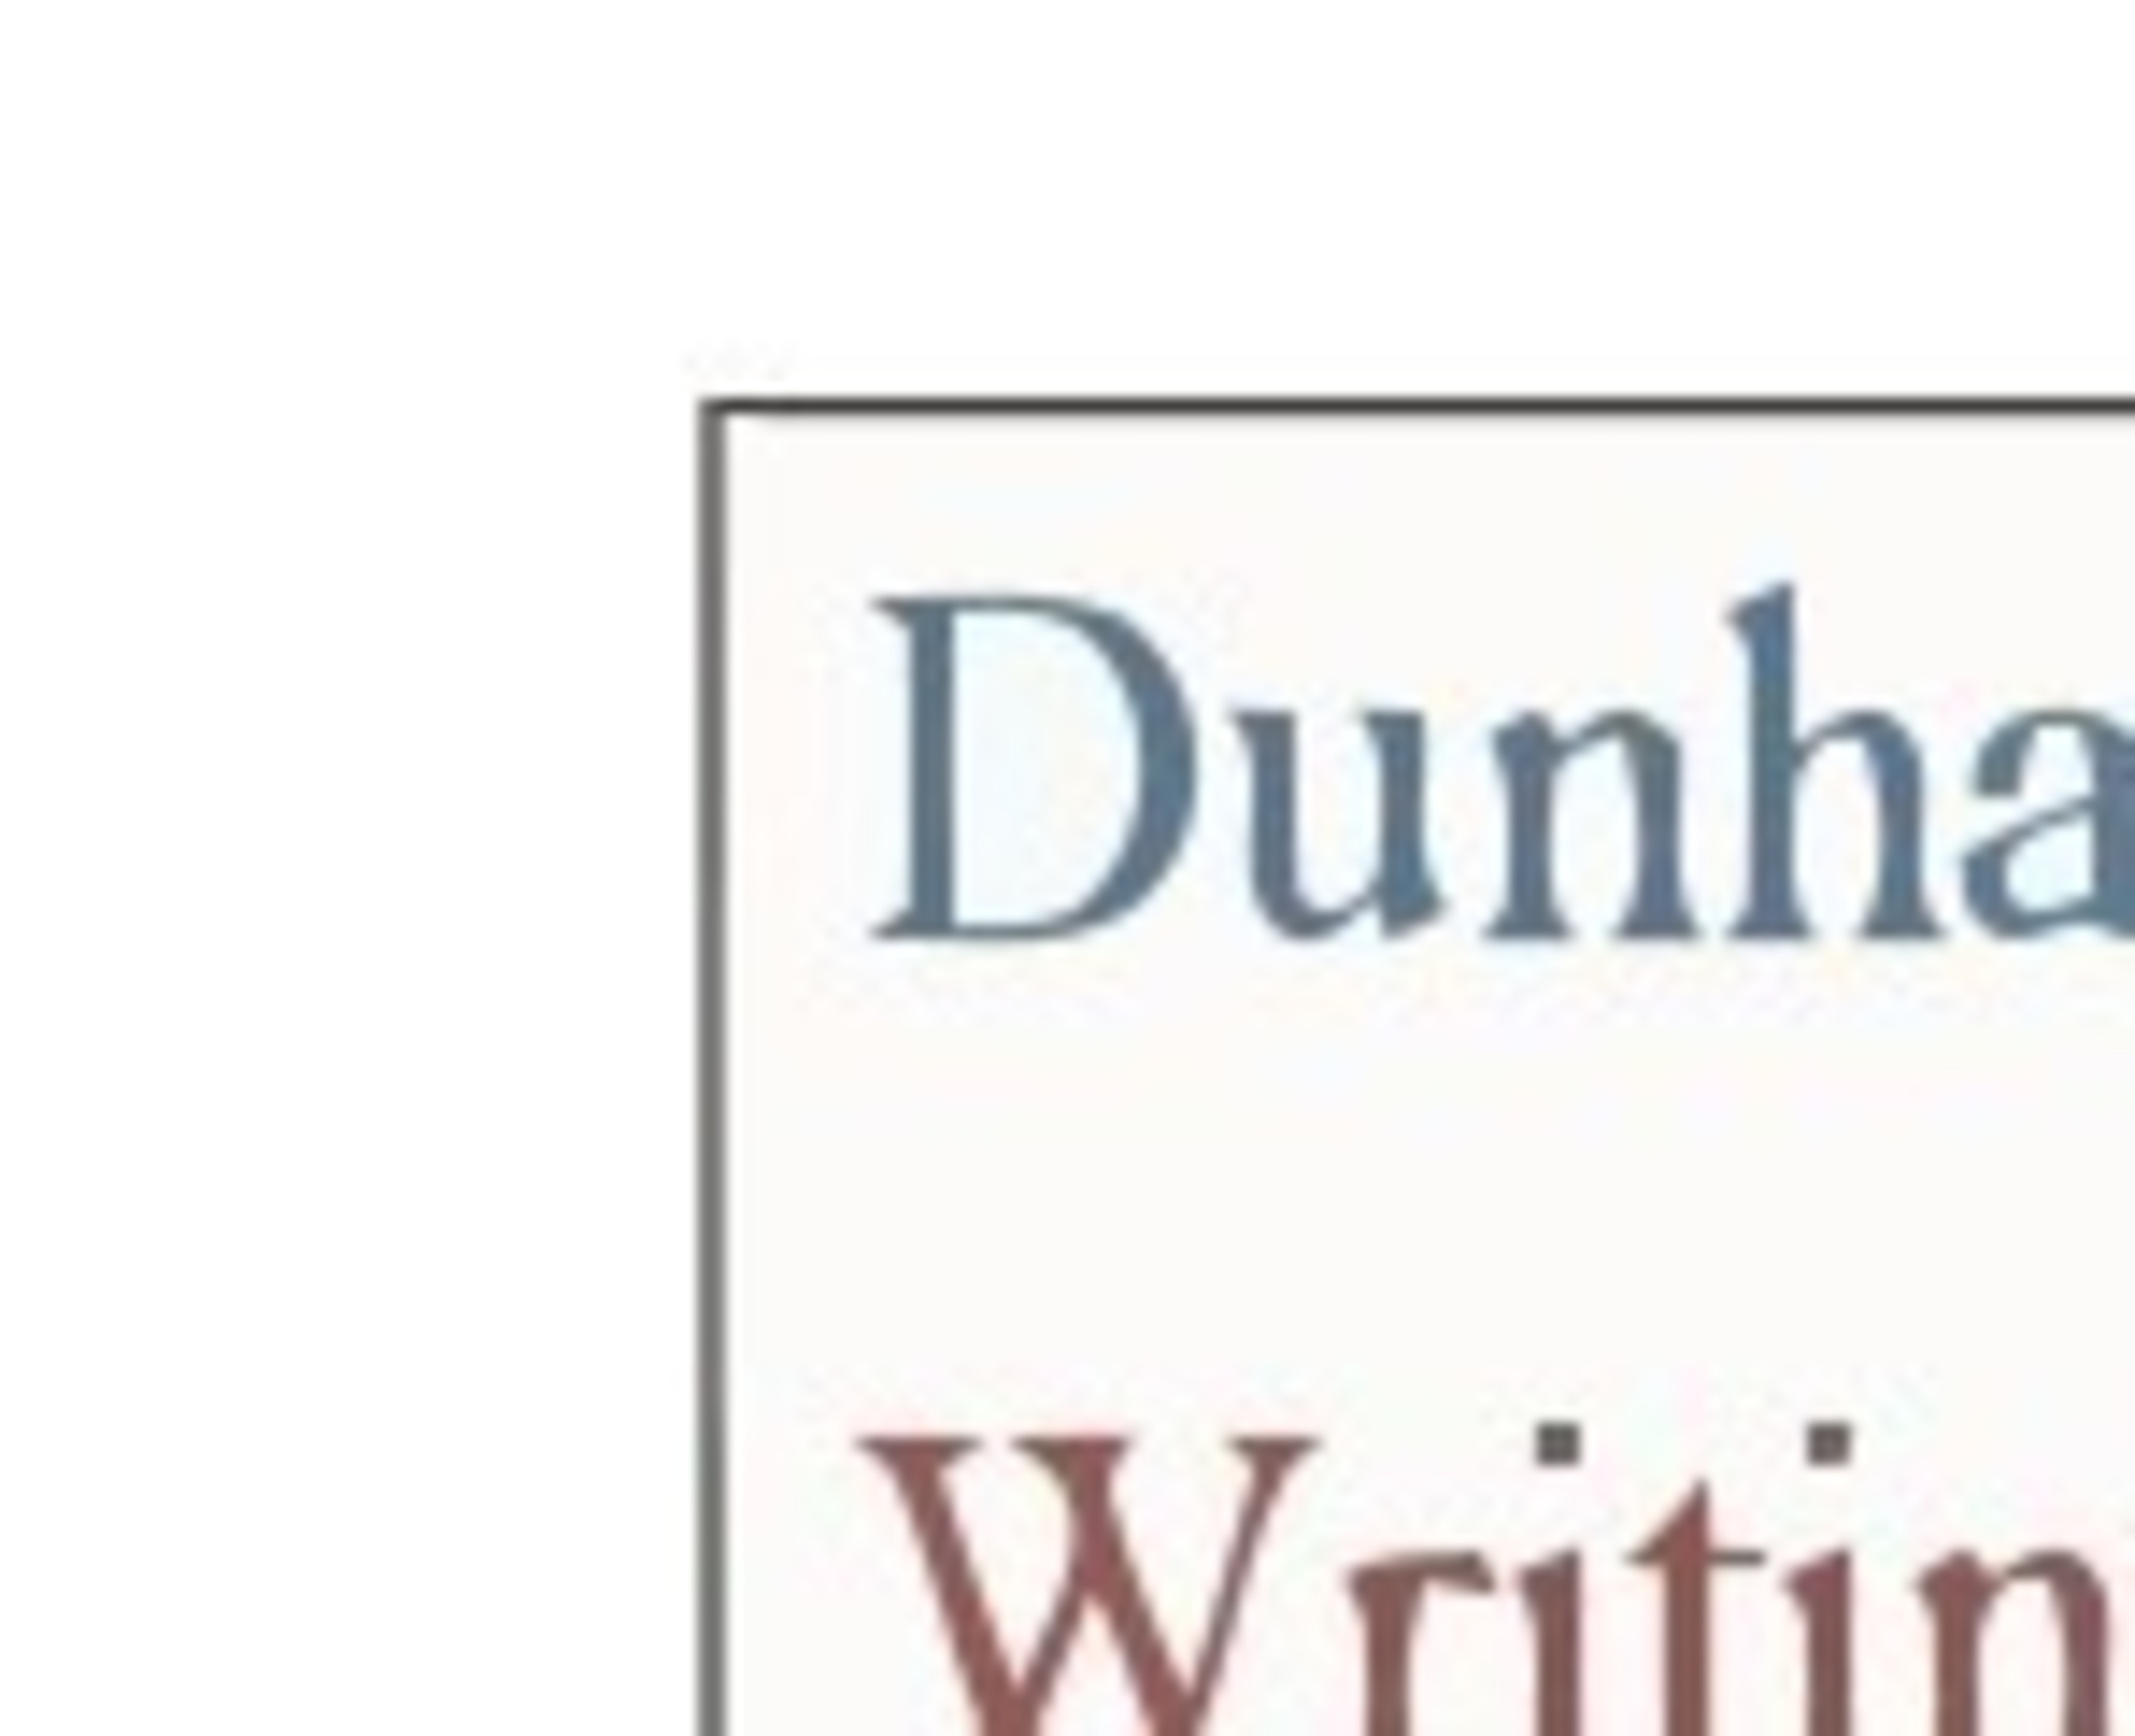 Dunham Writing logo (PRNewsFoto/Dunham Writing)